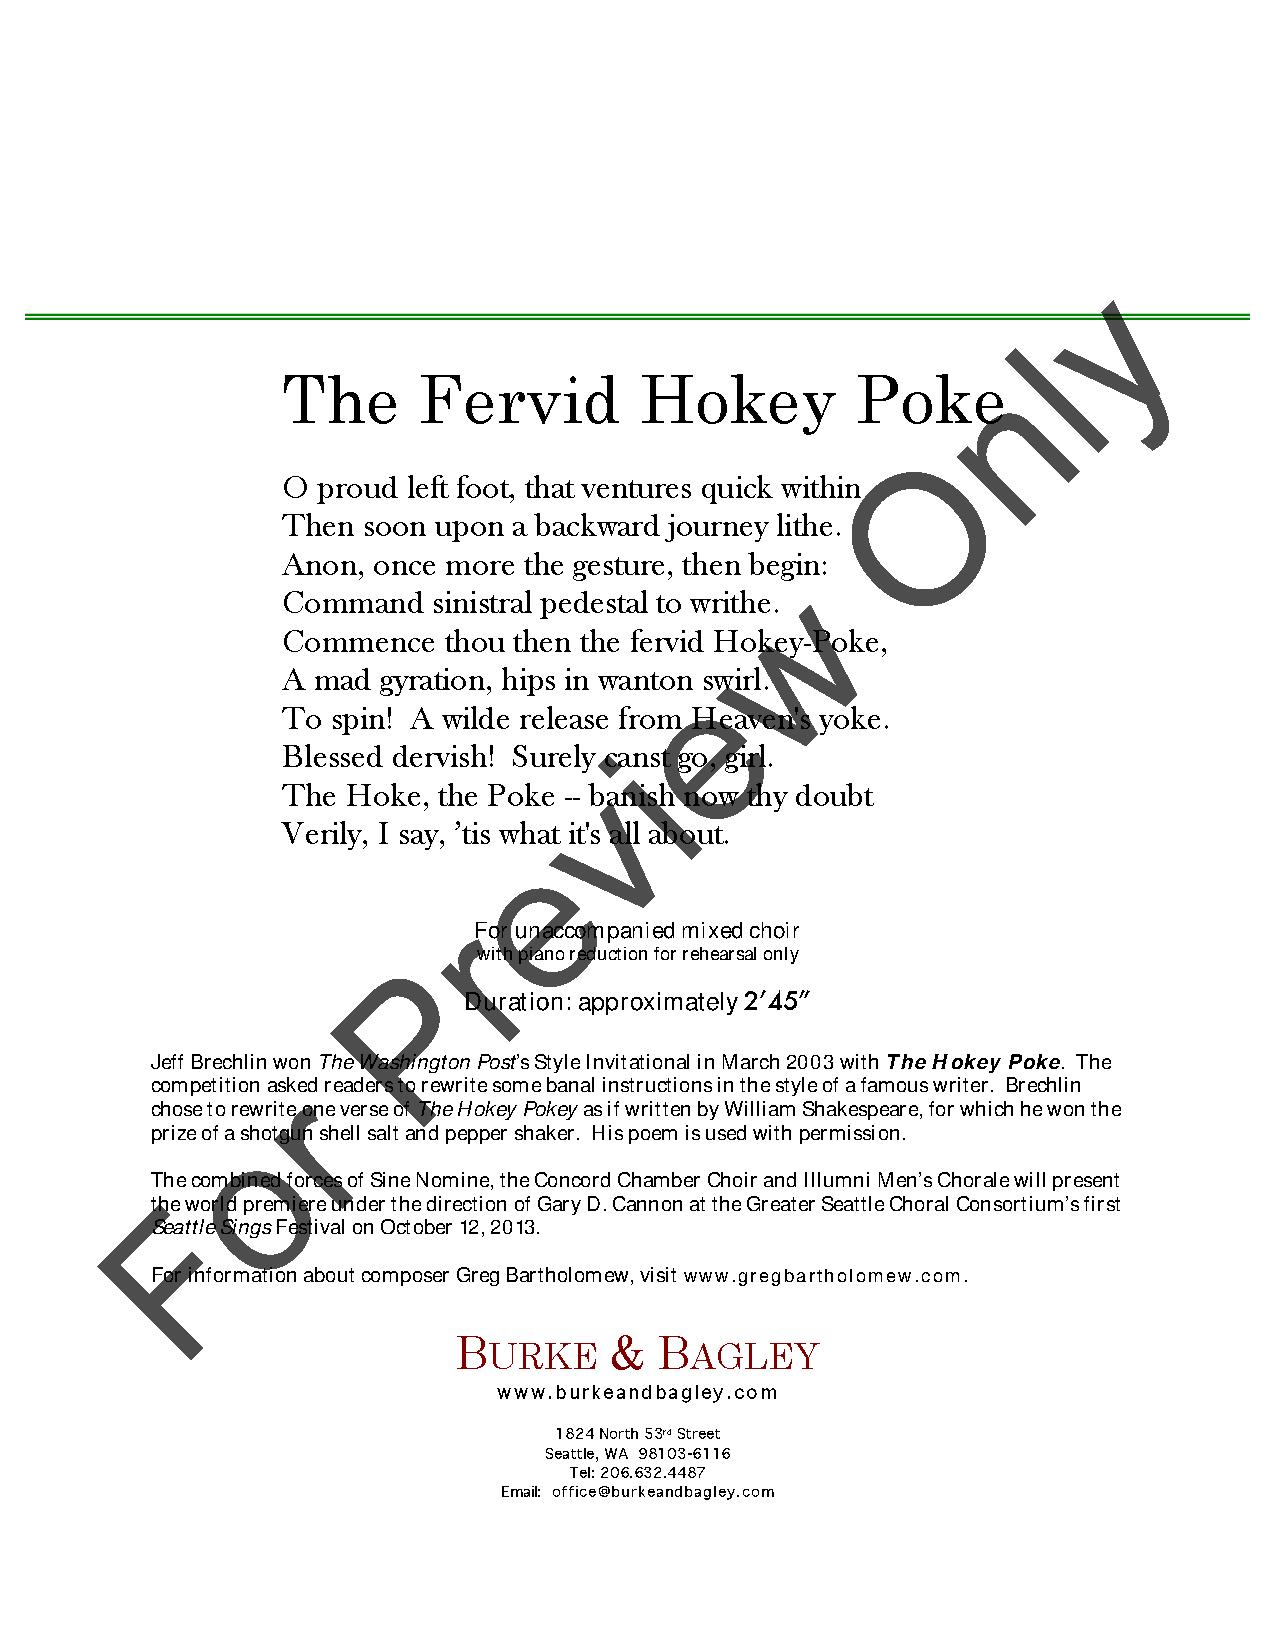 The Fervid Hokey Poke Thumbnail